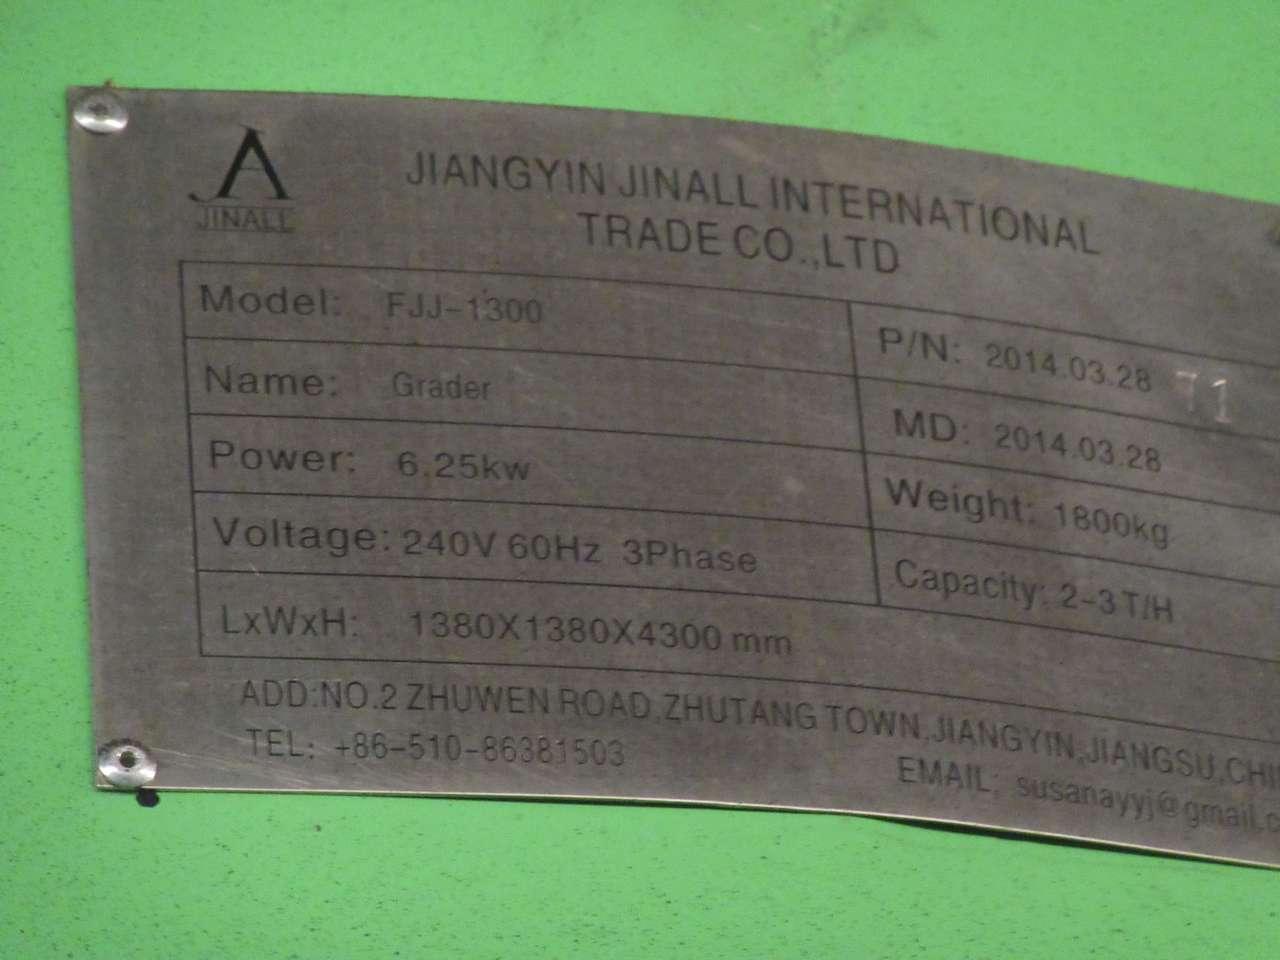 Lot 22 - 2014 Jiangyin Jinall International Trade Co. Grader